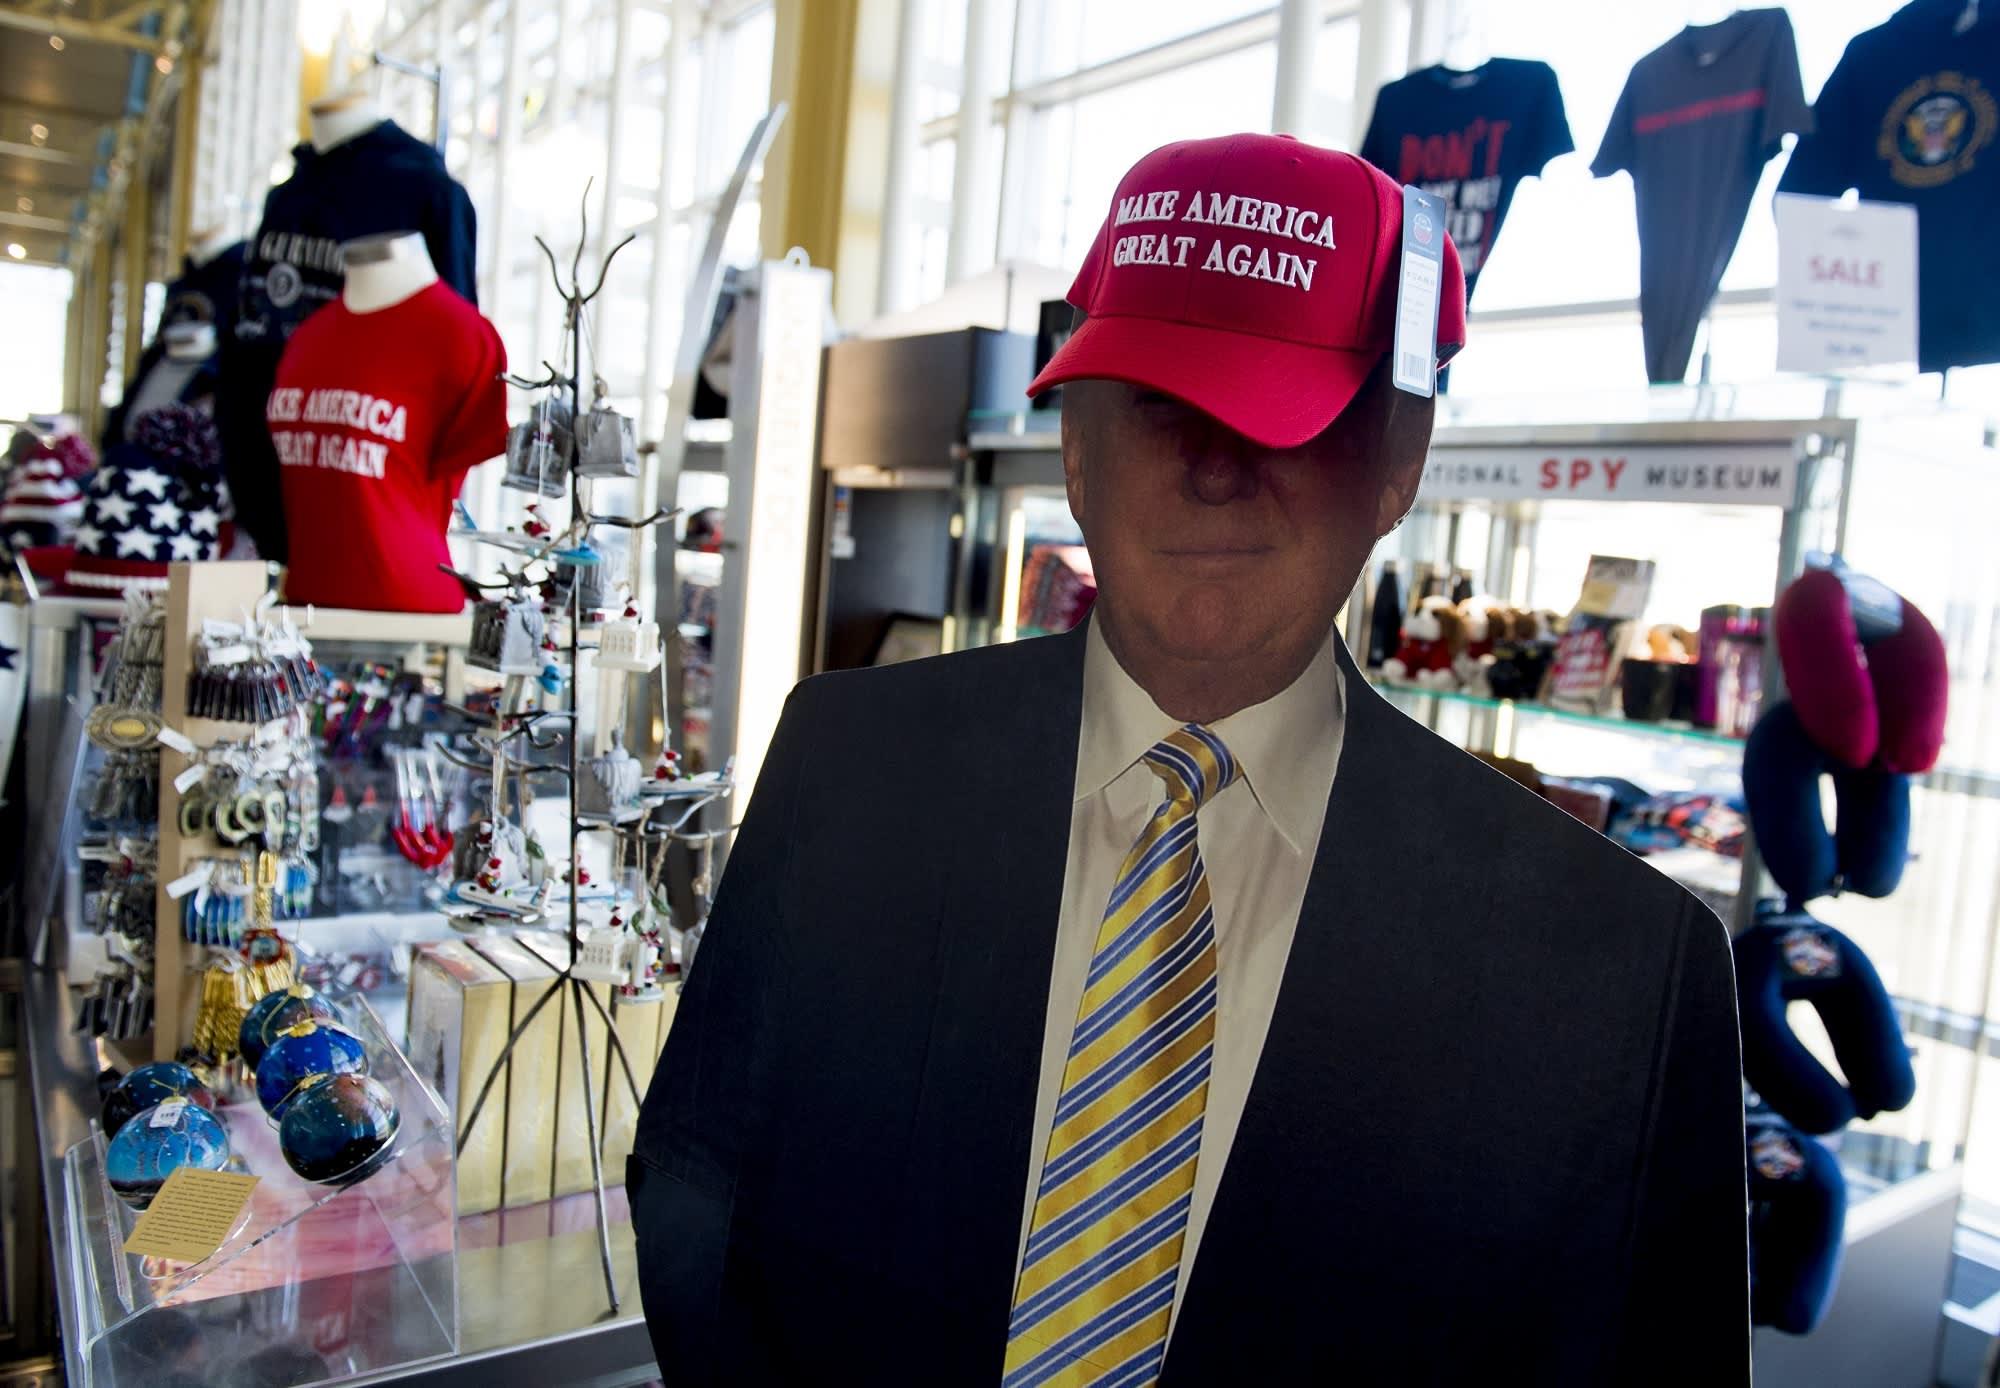 POTUS 45 KAG Make America Great Again- Keep America Great! High Quality Hat  Ball Cap President Donald Trump 2020 Election MAGA